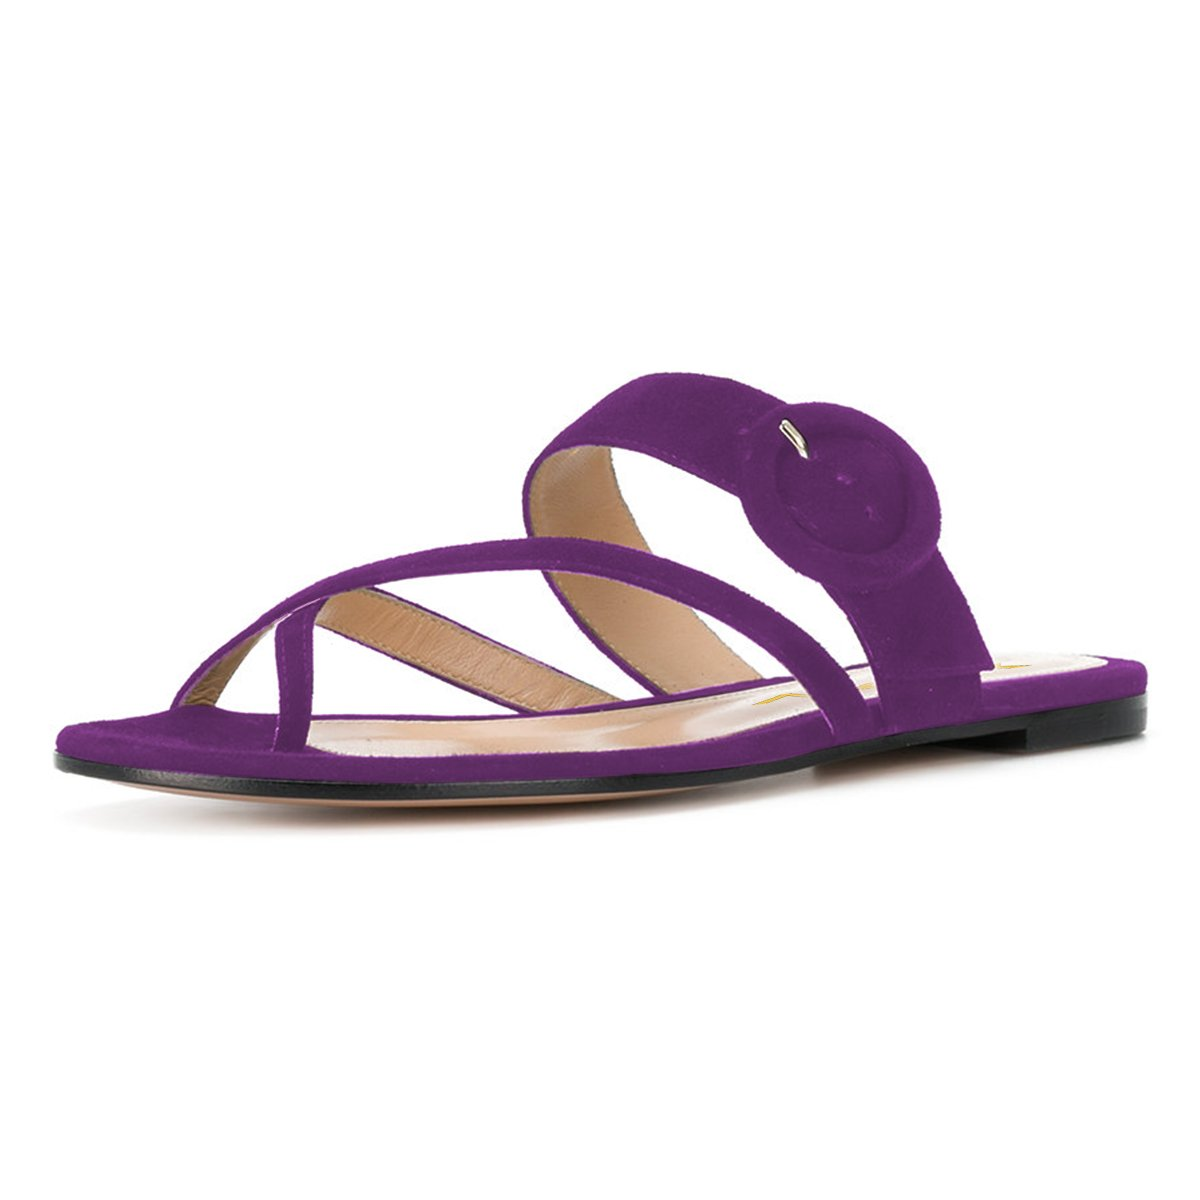 YDN Women Casual Flip Flops Sandals Slip on Sandals Low Heels Thong Shoes Buckle Purple 13